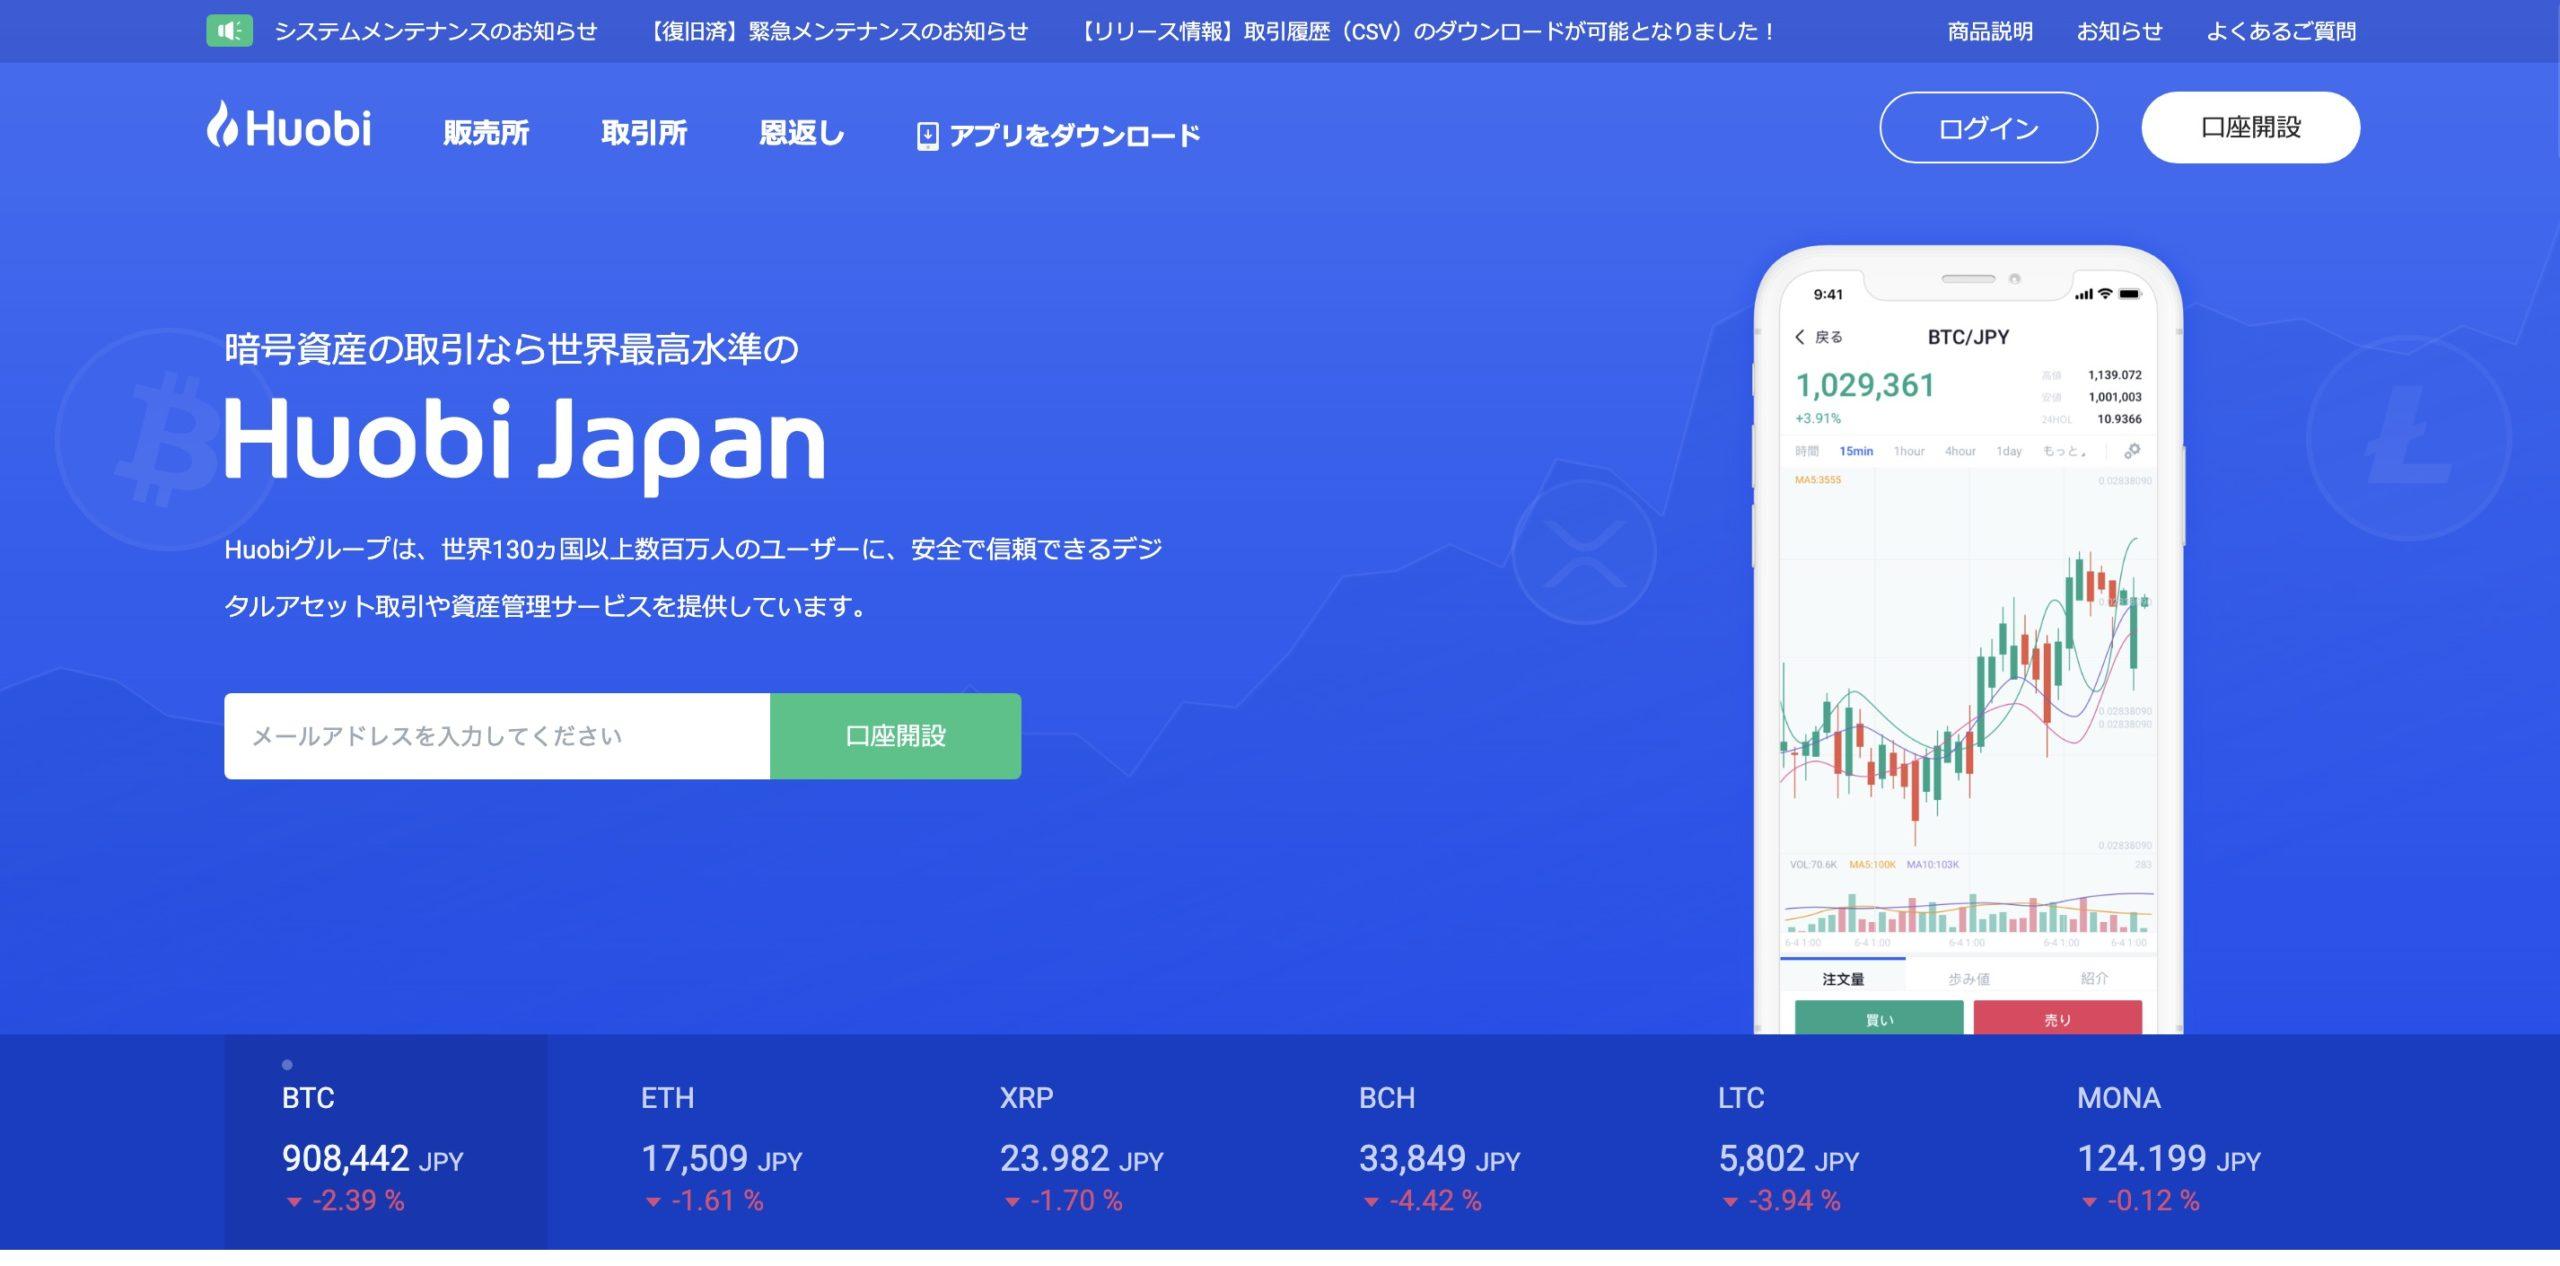 huobi フォビ 仮想通貨 取引所